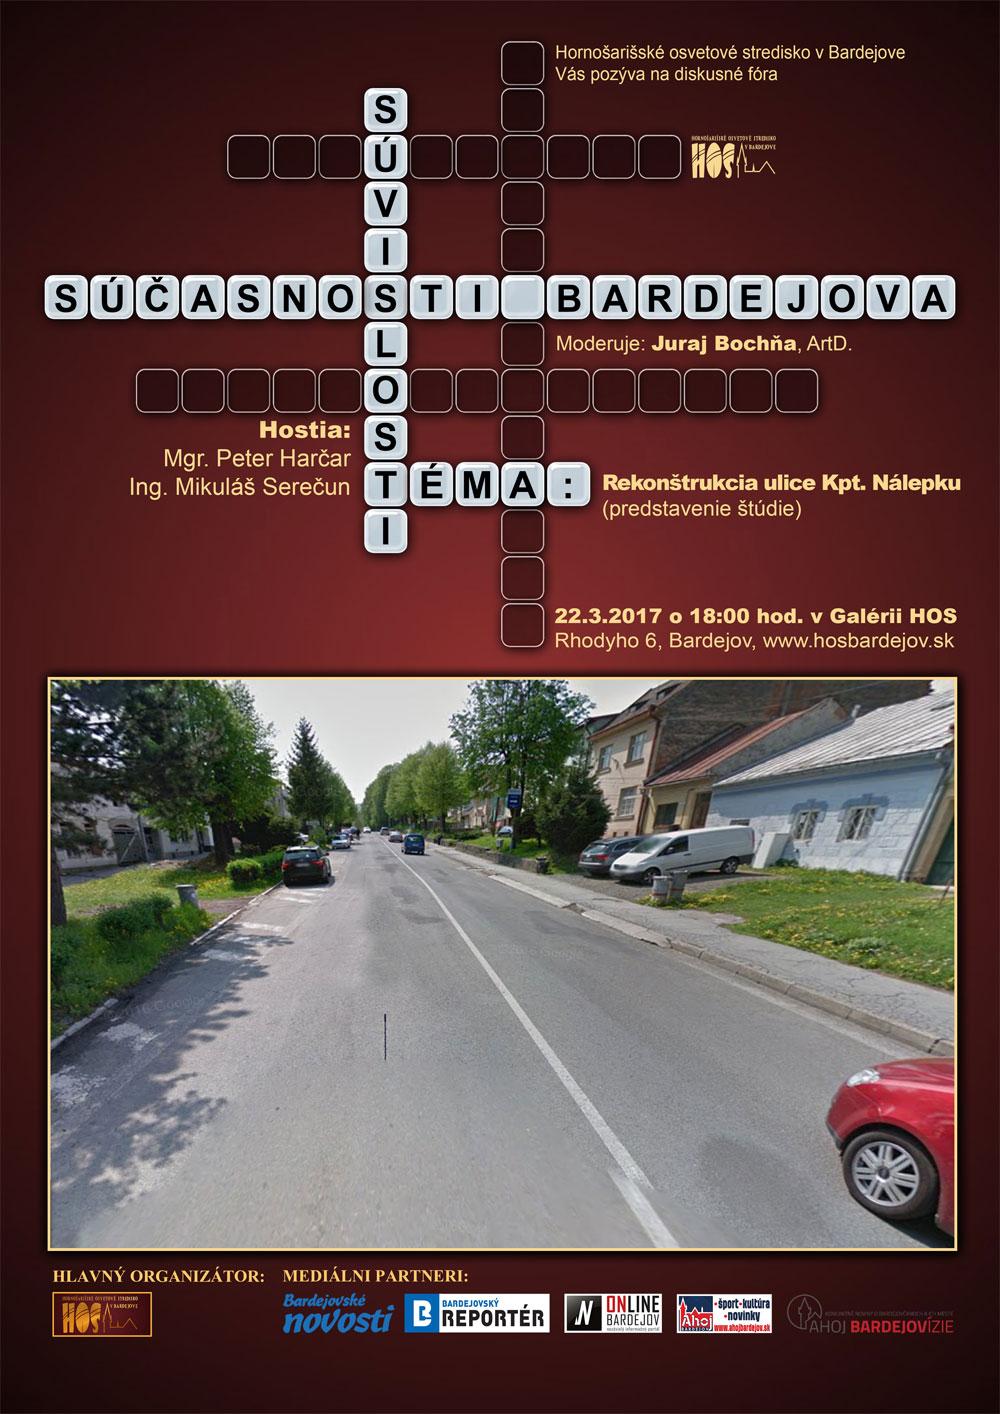 Súvislosti súčasnosti Bardejova – Rekonštrukcia ulice Kpt. Nálepku